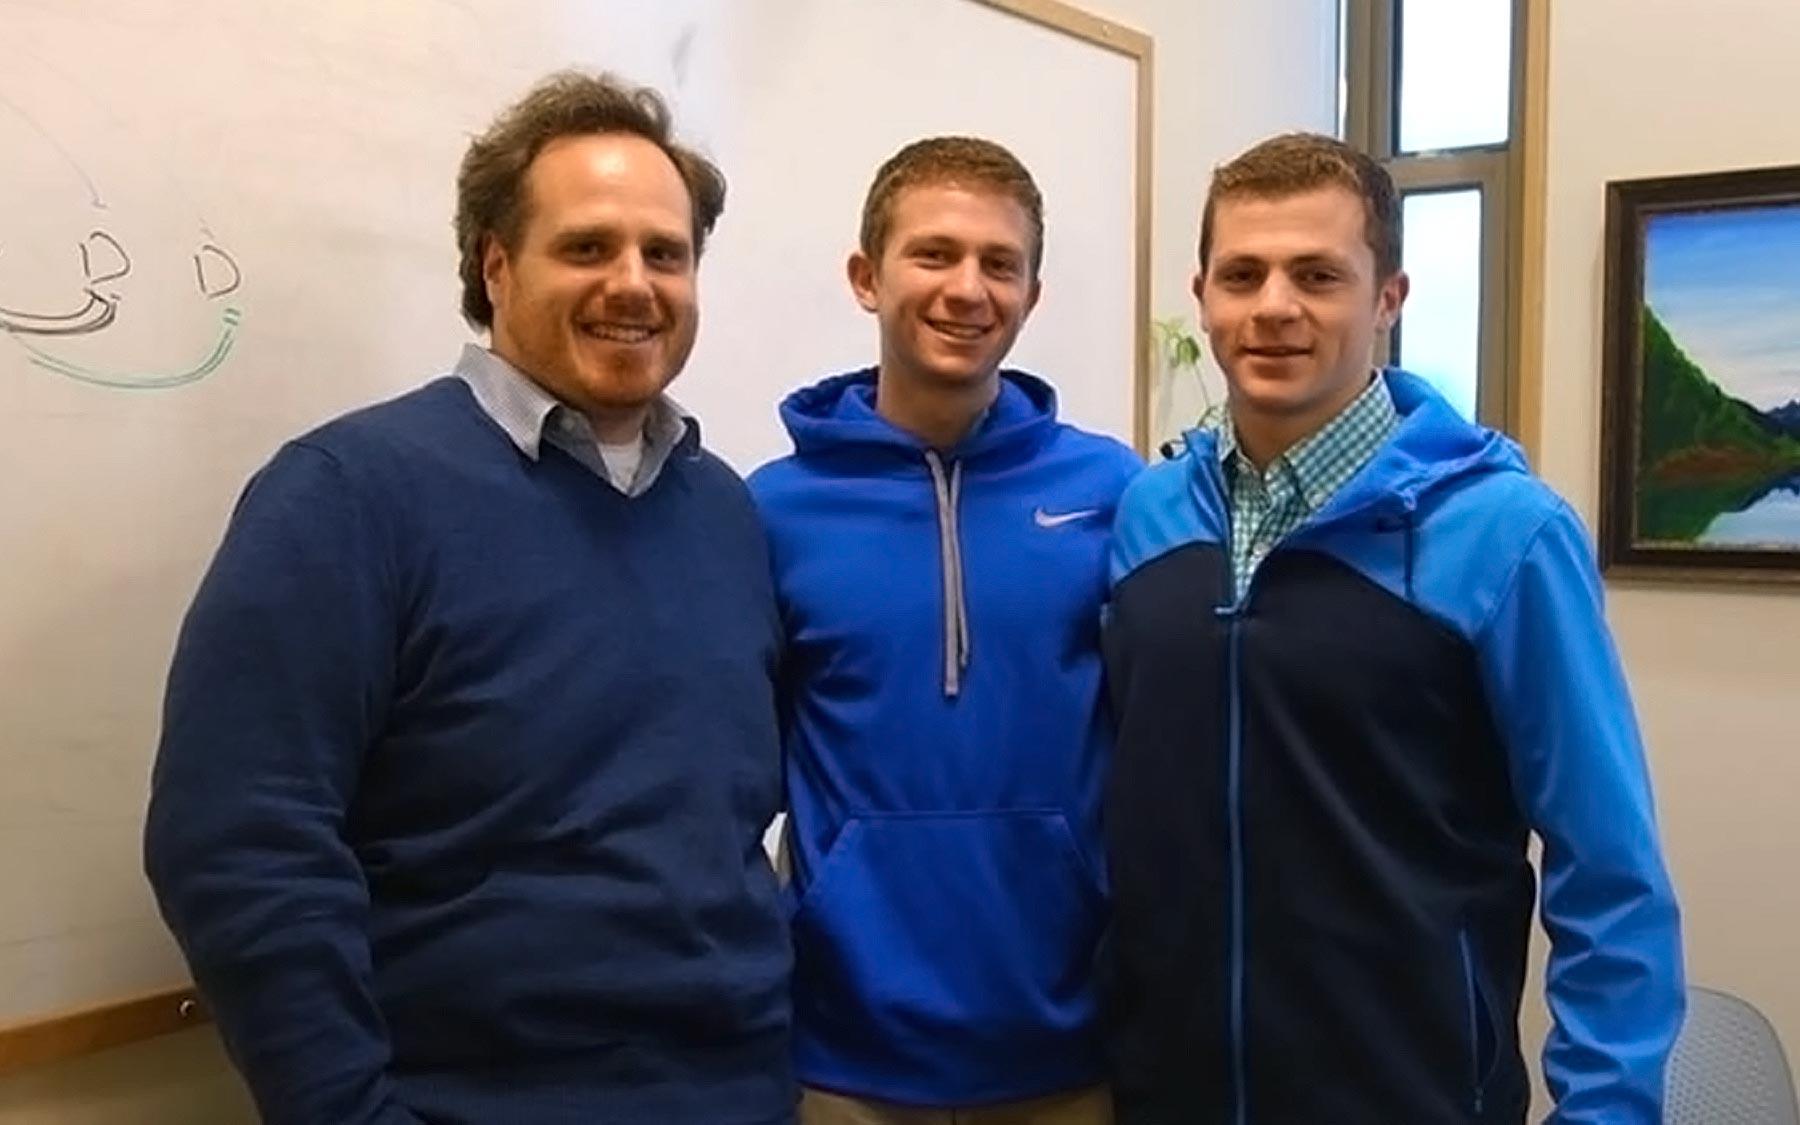 Dr. Michael Schatz, Aspyn and Skyler Palatnick